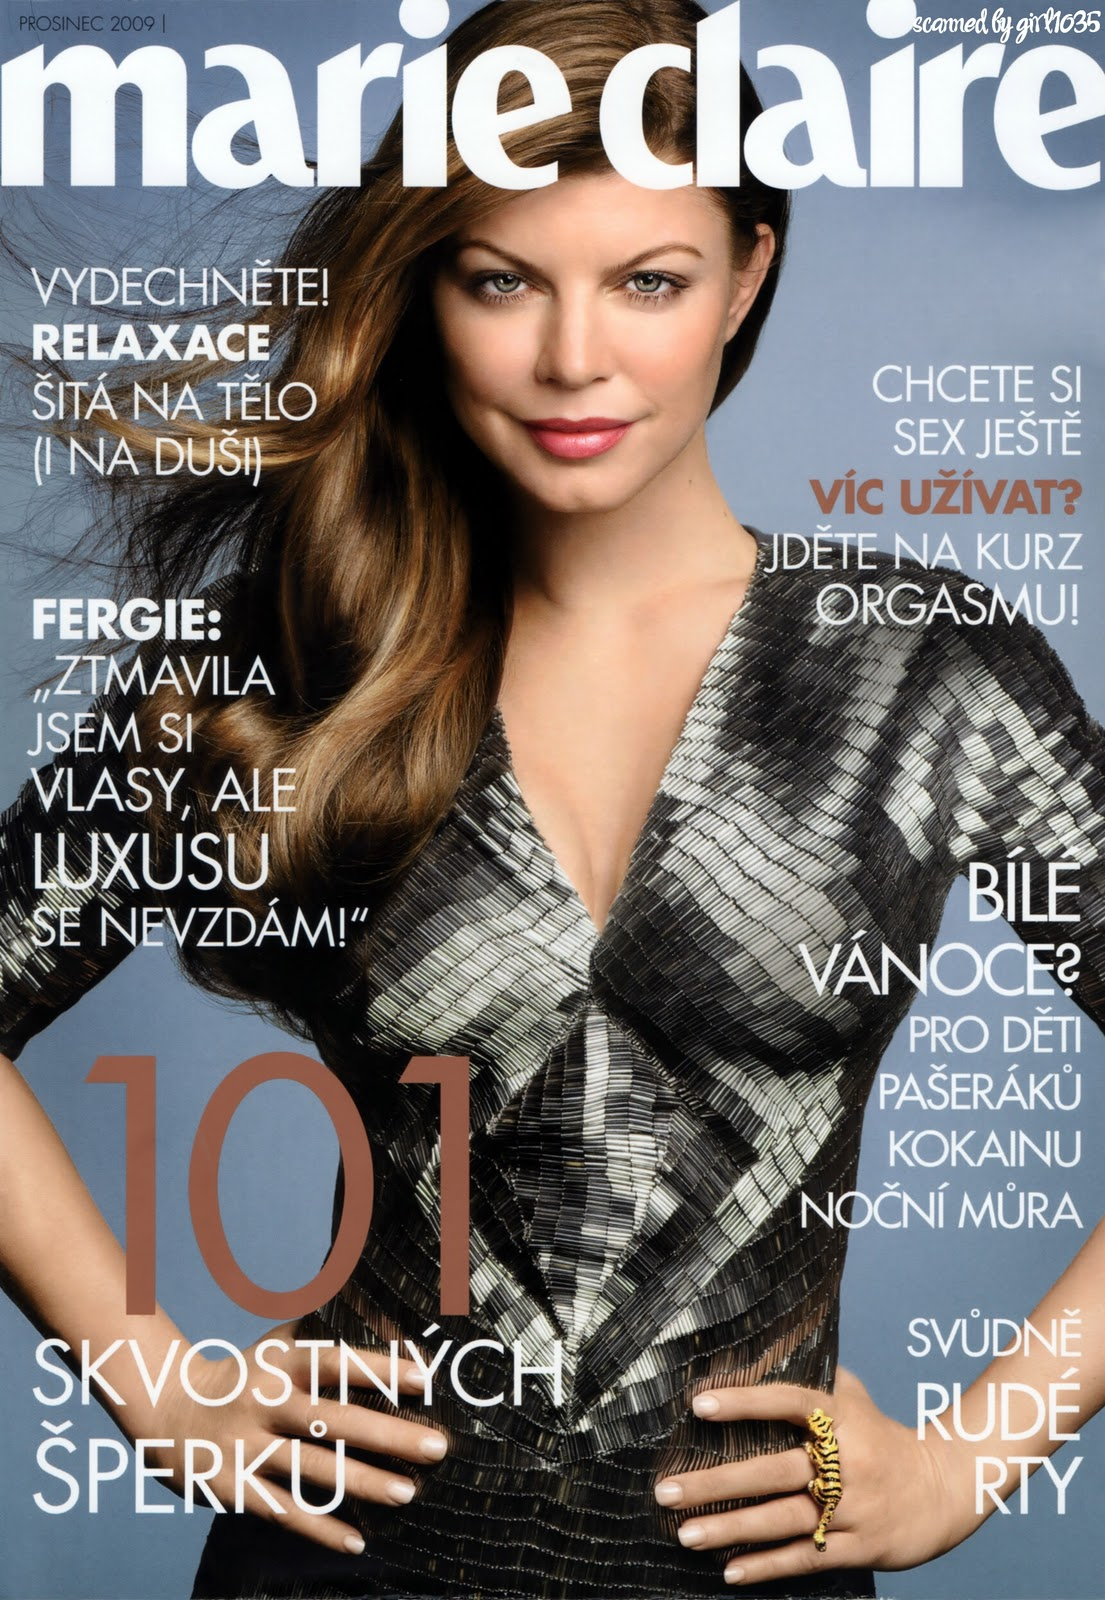 http://4.bp.blogspot.com/_RU2CXK5dEOU/TO19US8NuDI/AAAAAAAAAgA/9HZa72zzw_s/s1600/stacy_ferguson_marie_claire_magazine_cz_december_2009_001.jpg